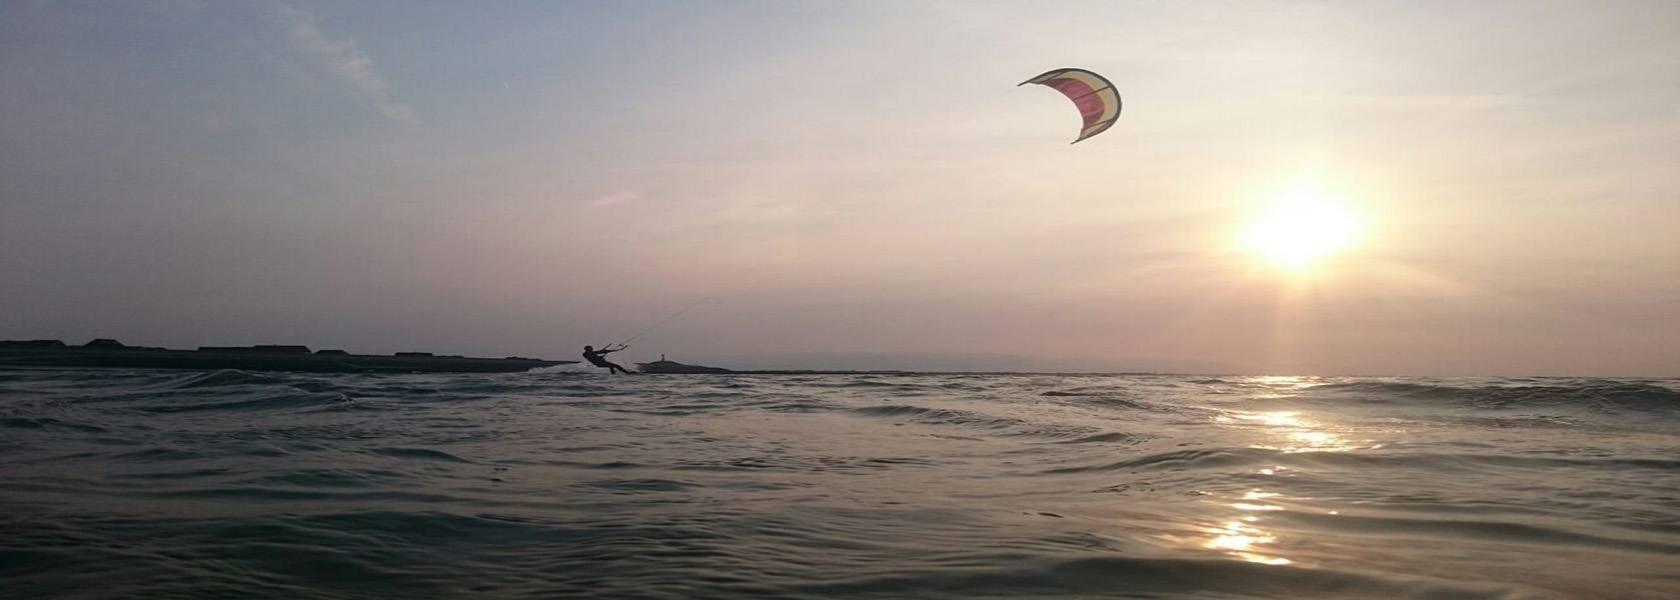 Kitesurfen an der Nordsee, © Die Nordsee GmbH, Jantje Olchers